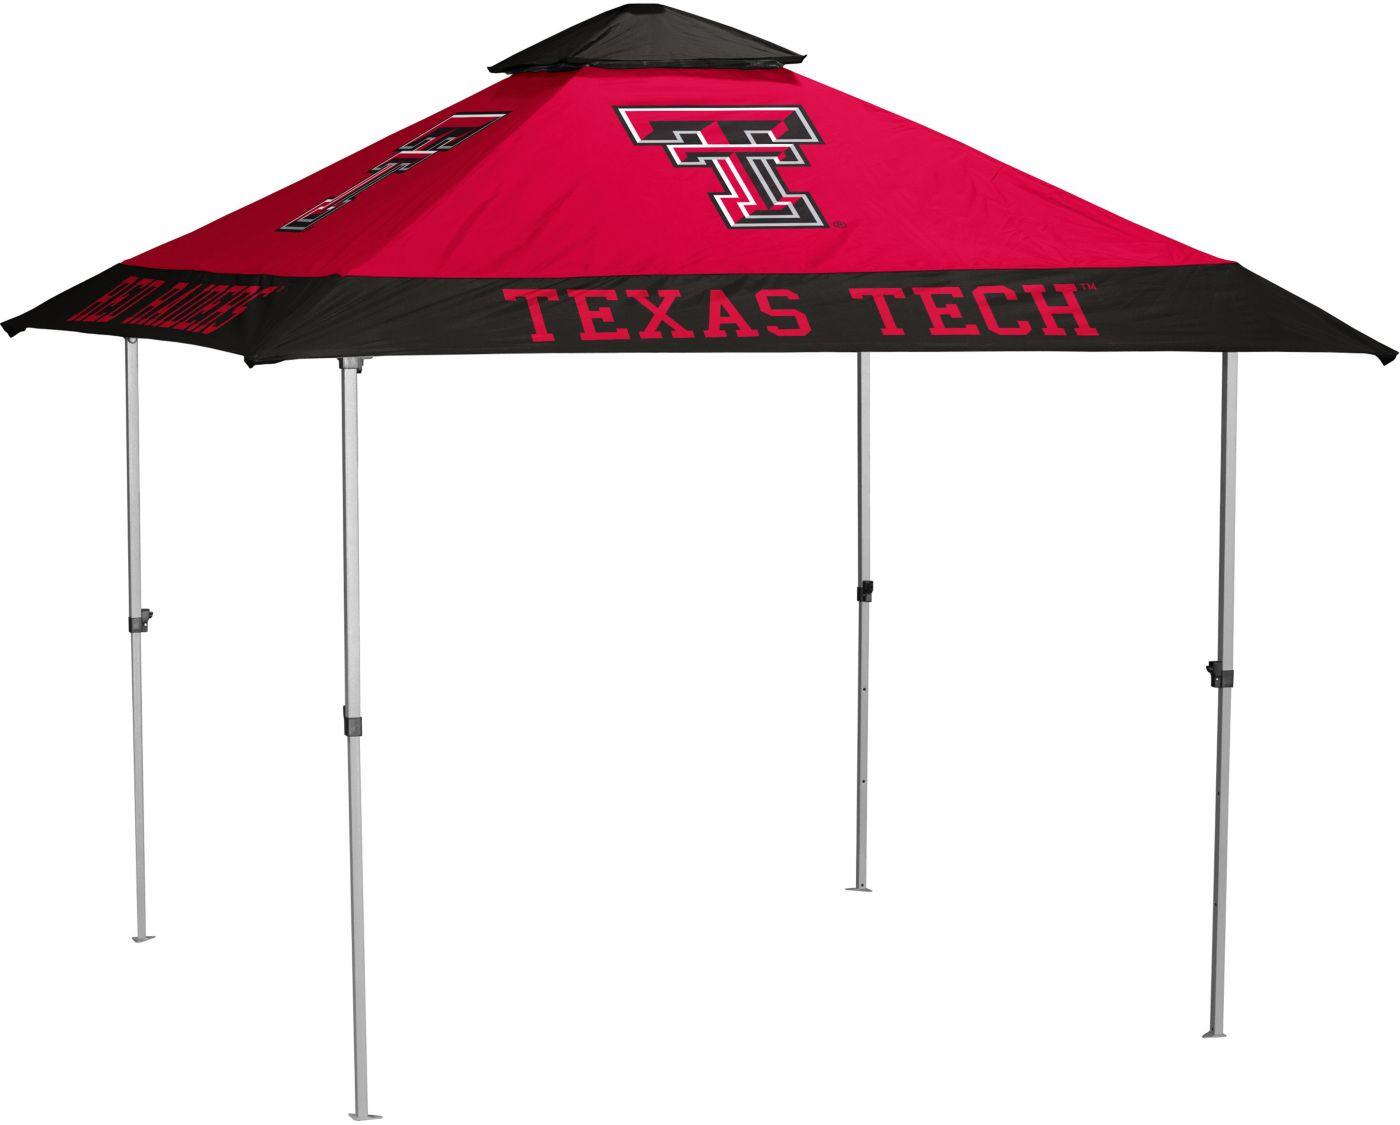 Texas Tech Red Raiders Pagoda Canopy